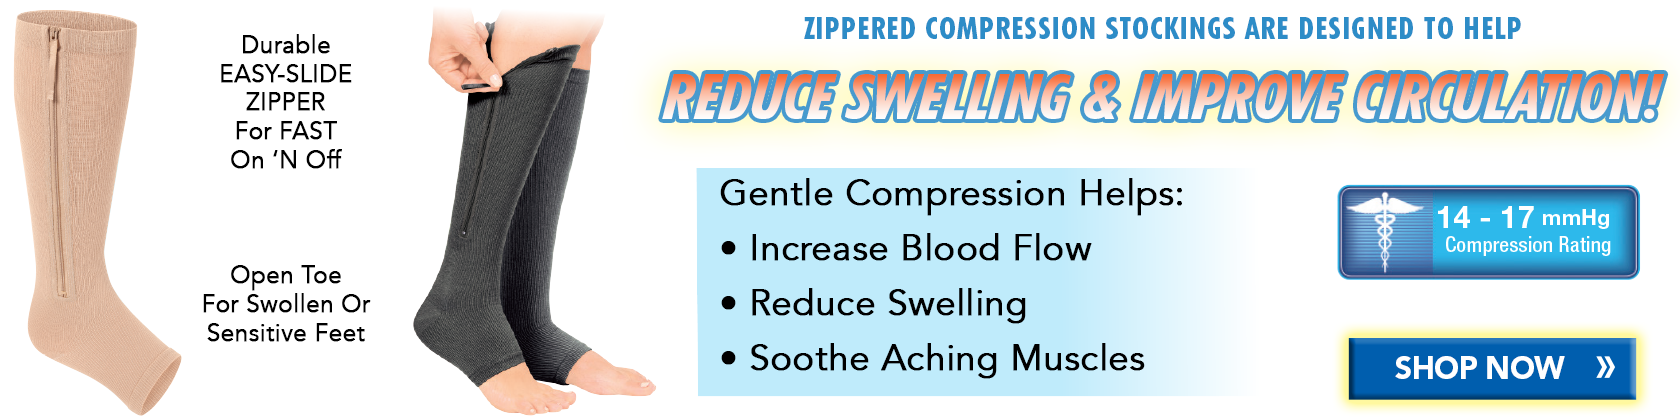 Zippered Compression Stockings Desktop